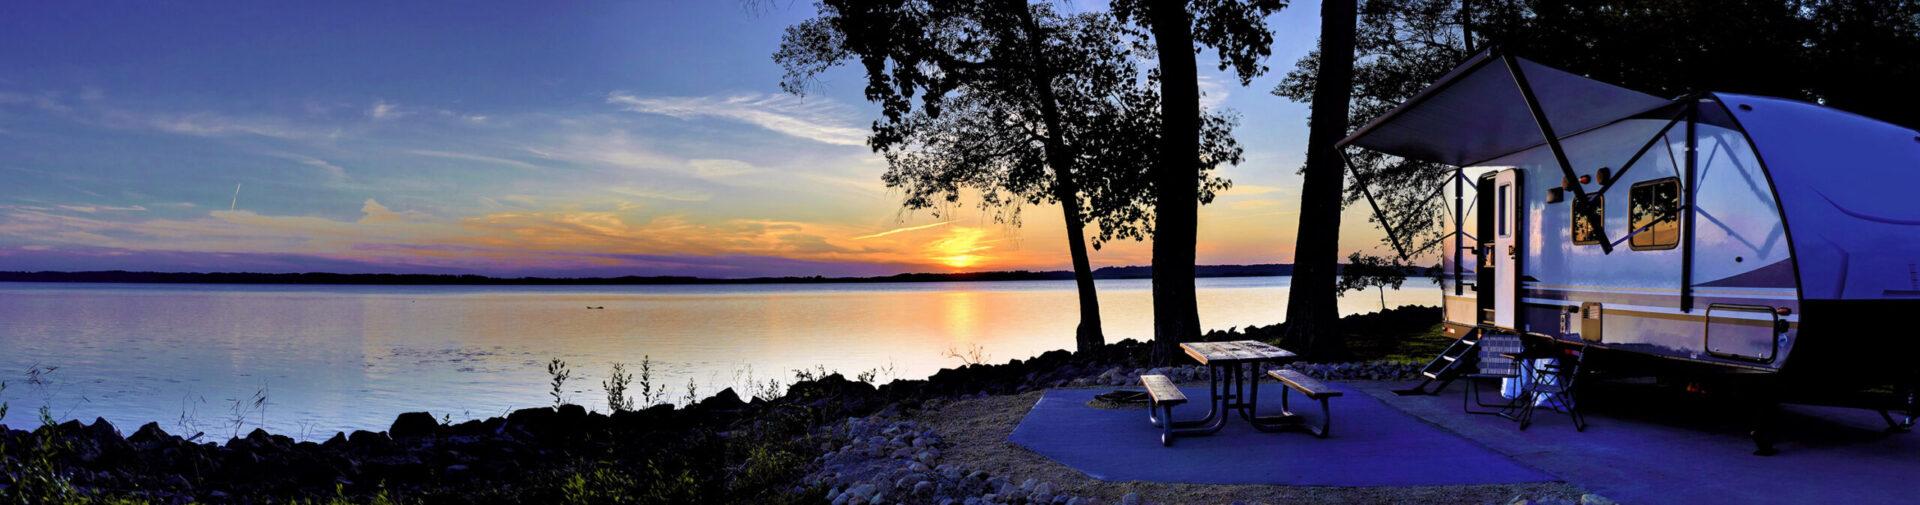 camper at the lake